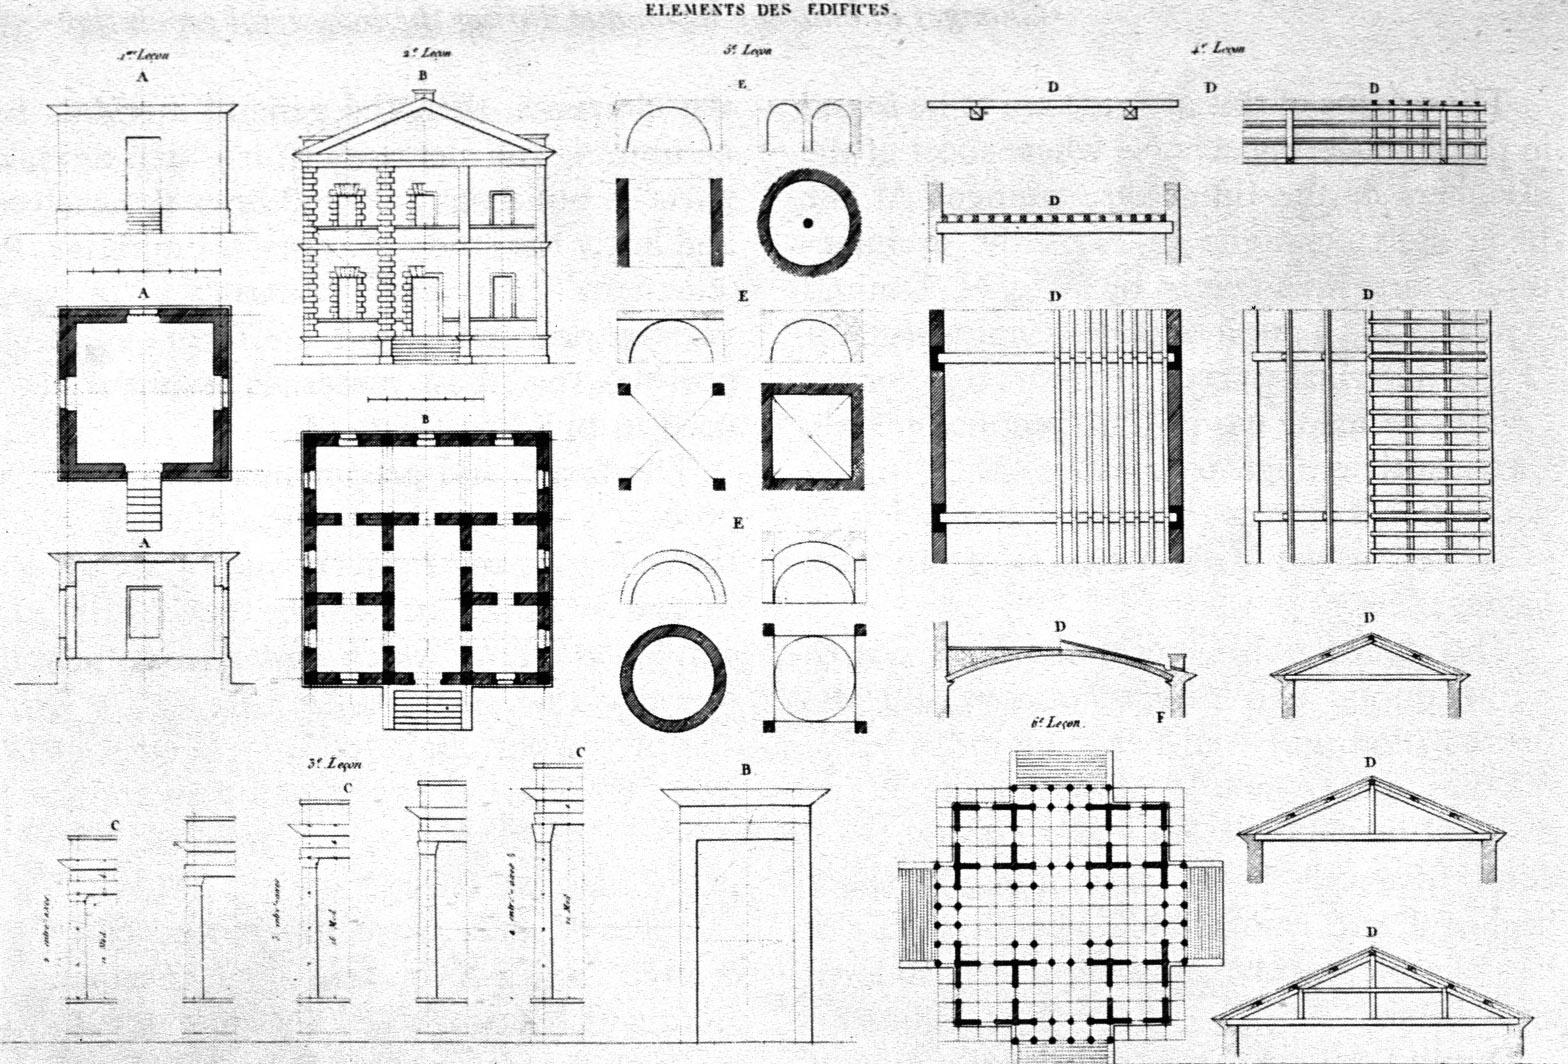 Jean Nicolas Louis Durand, Elements of Building, 1823.